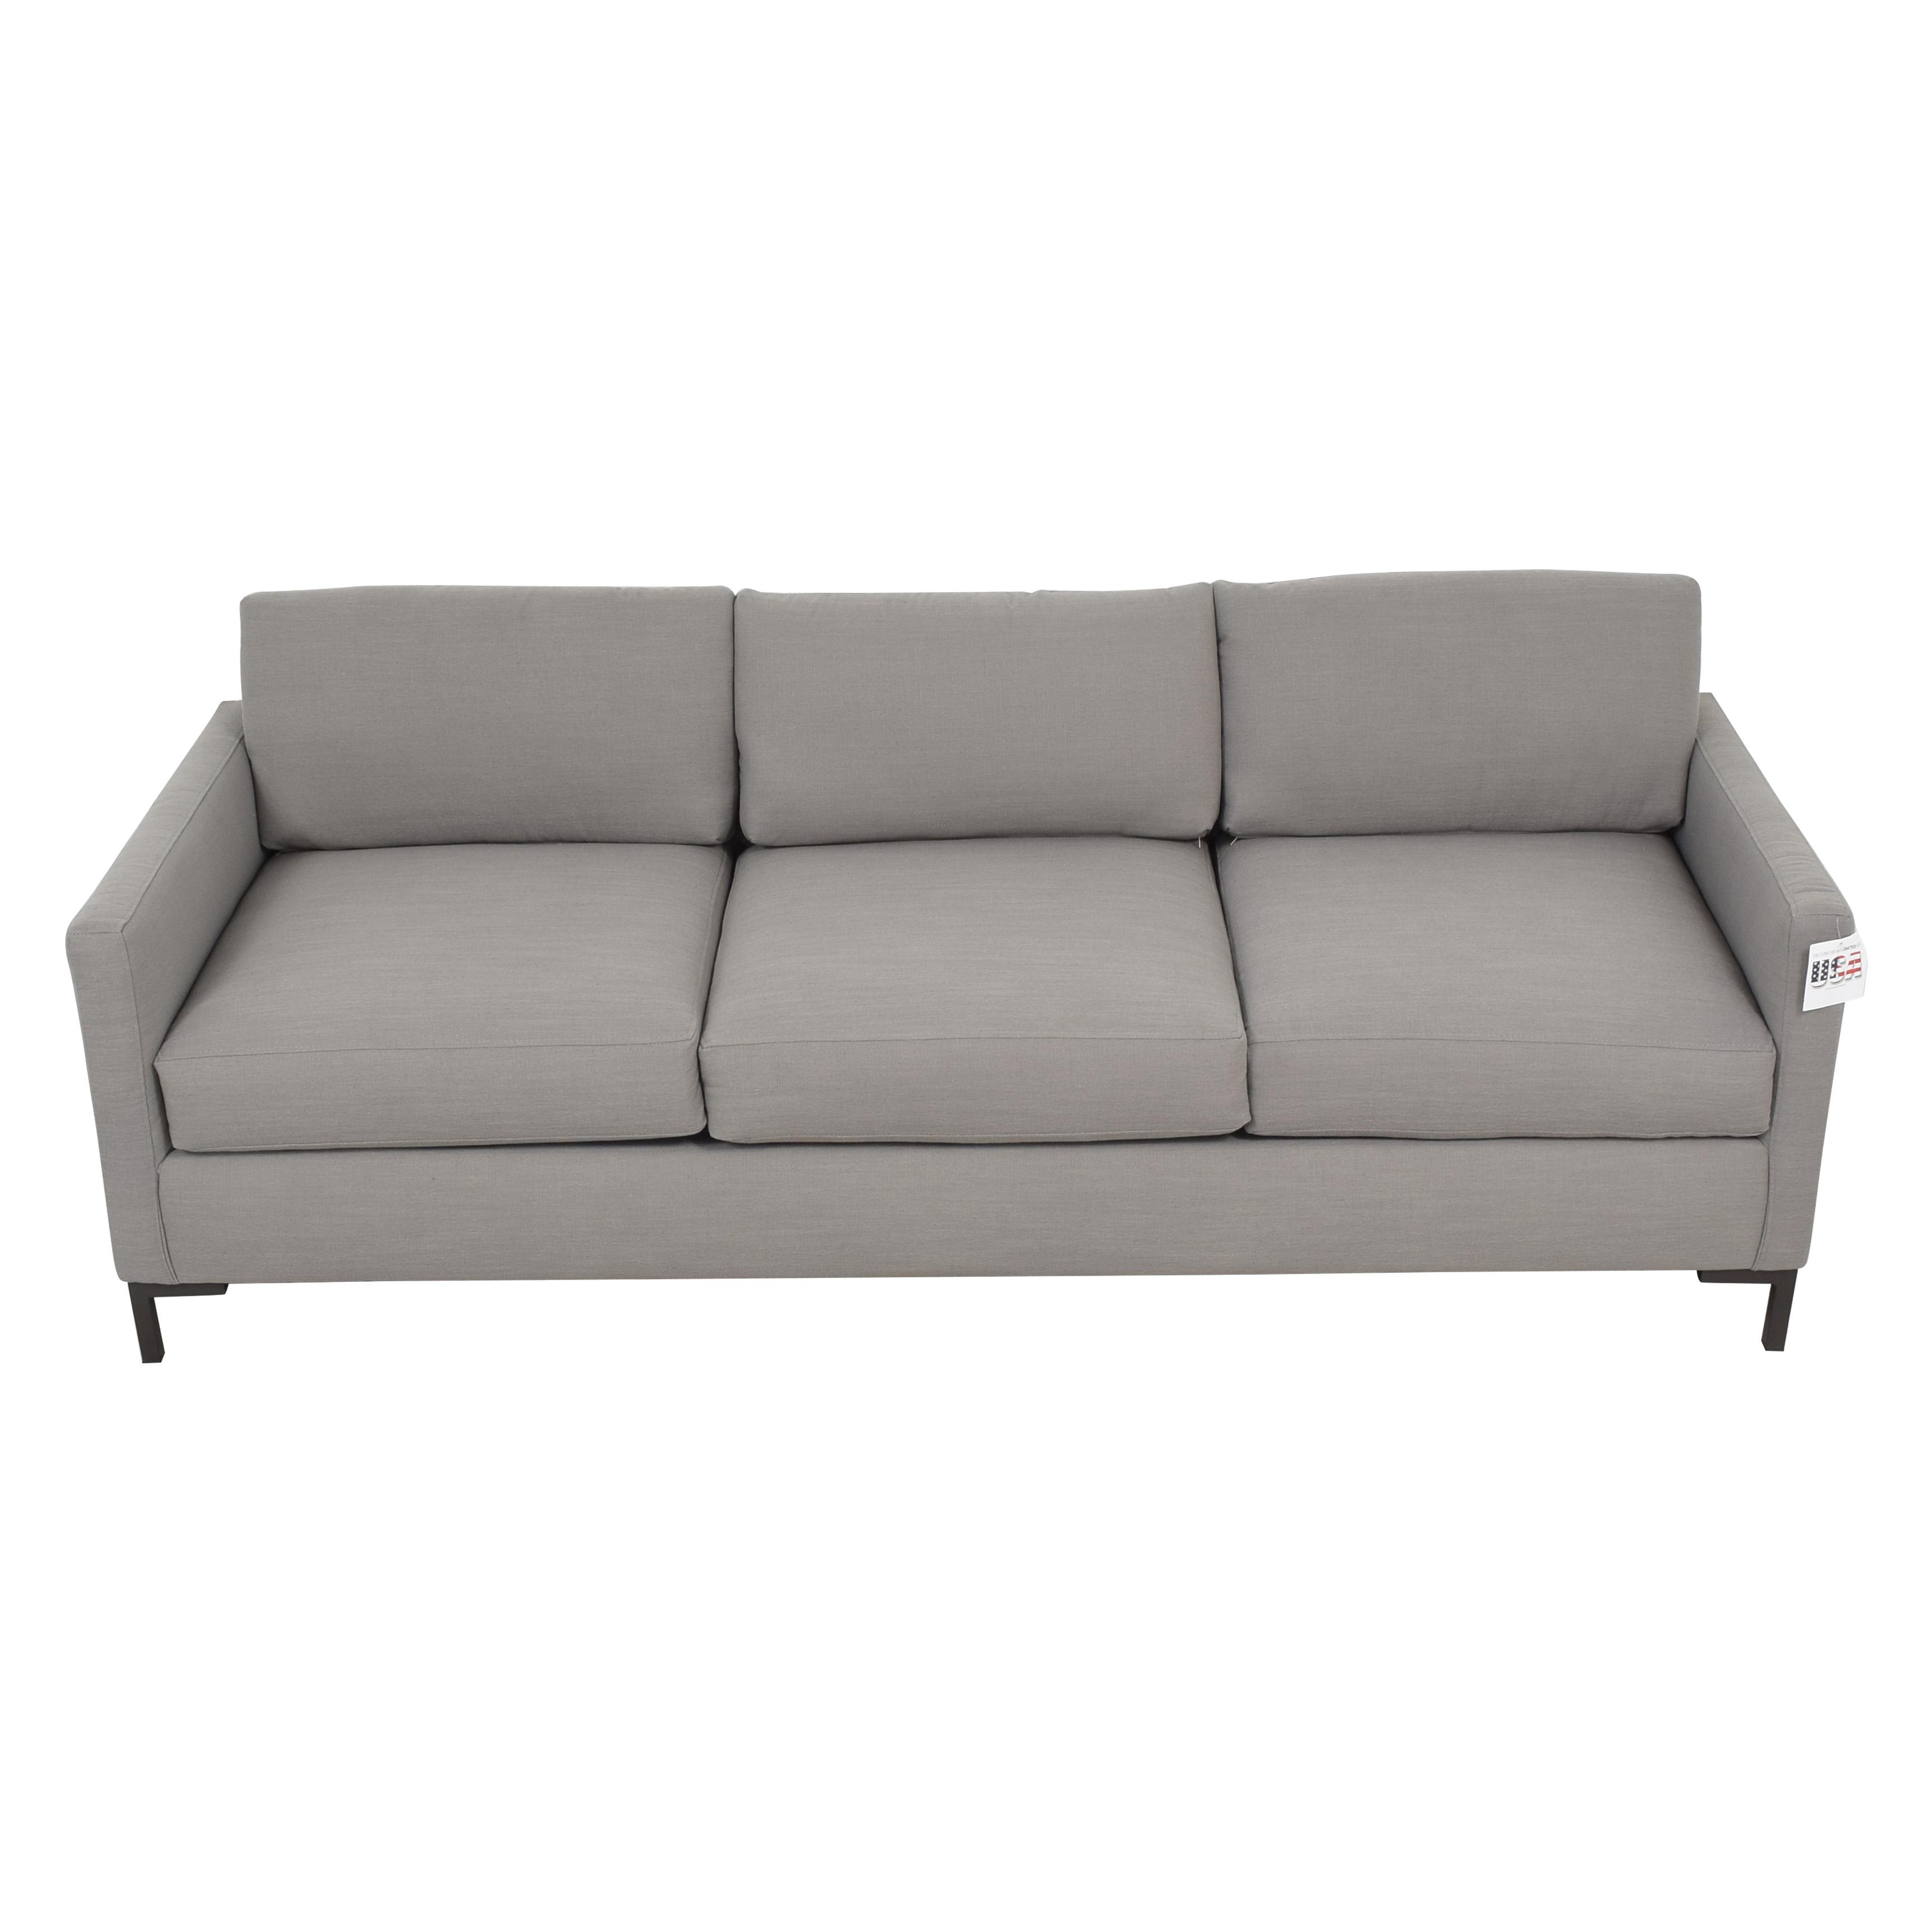 The Inside Modern Sofa sale